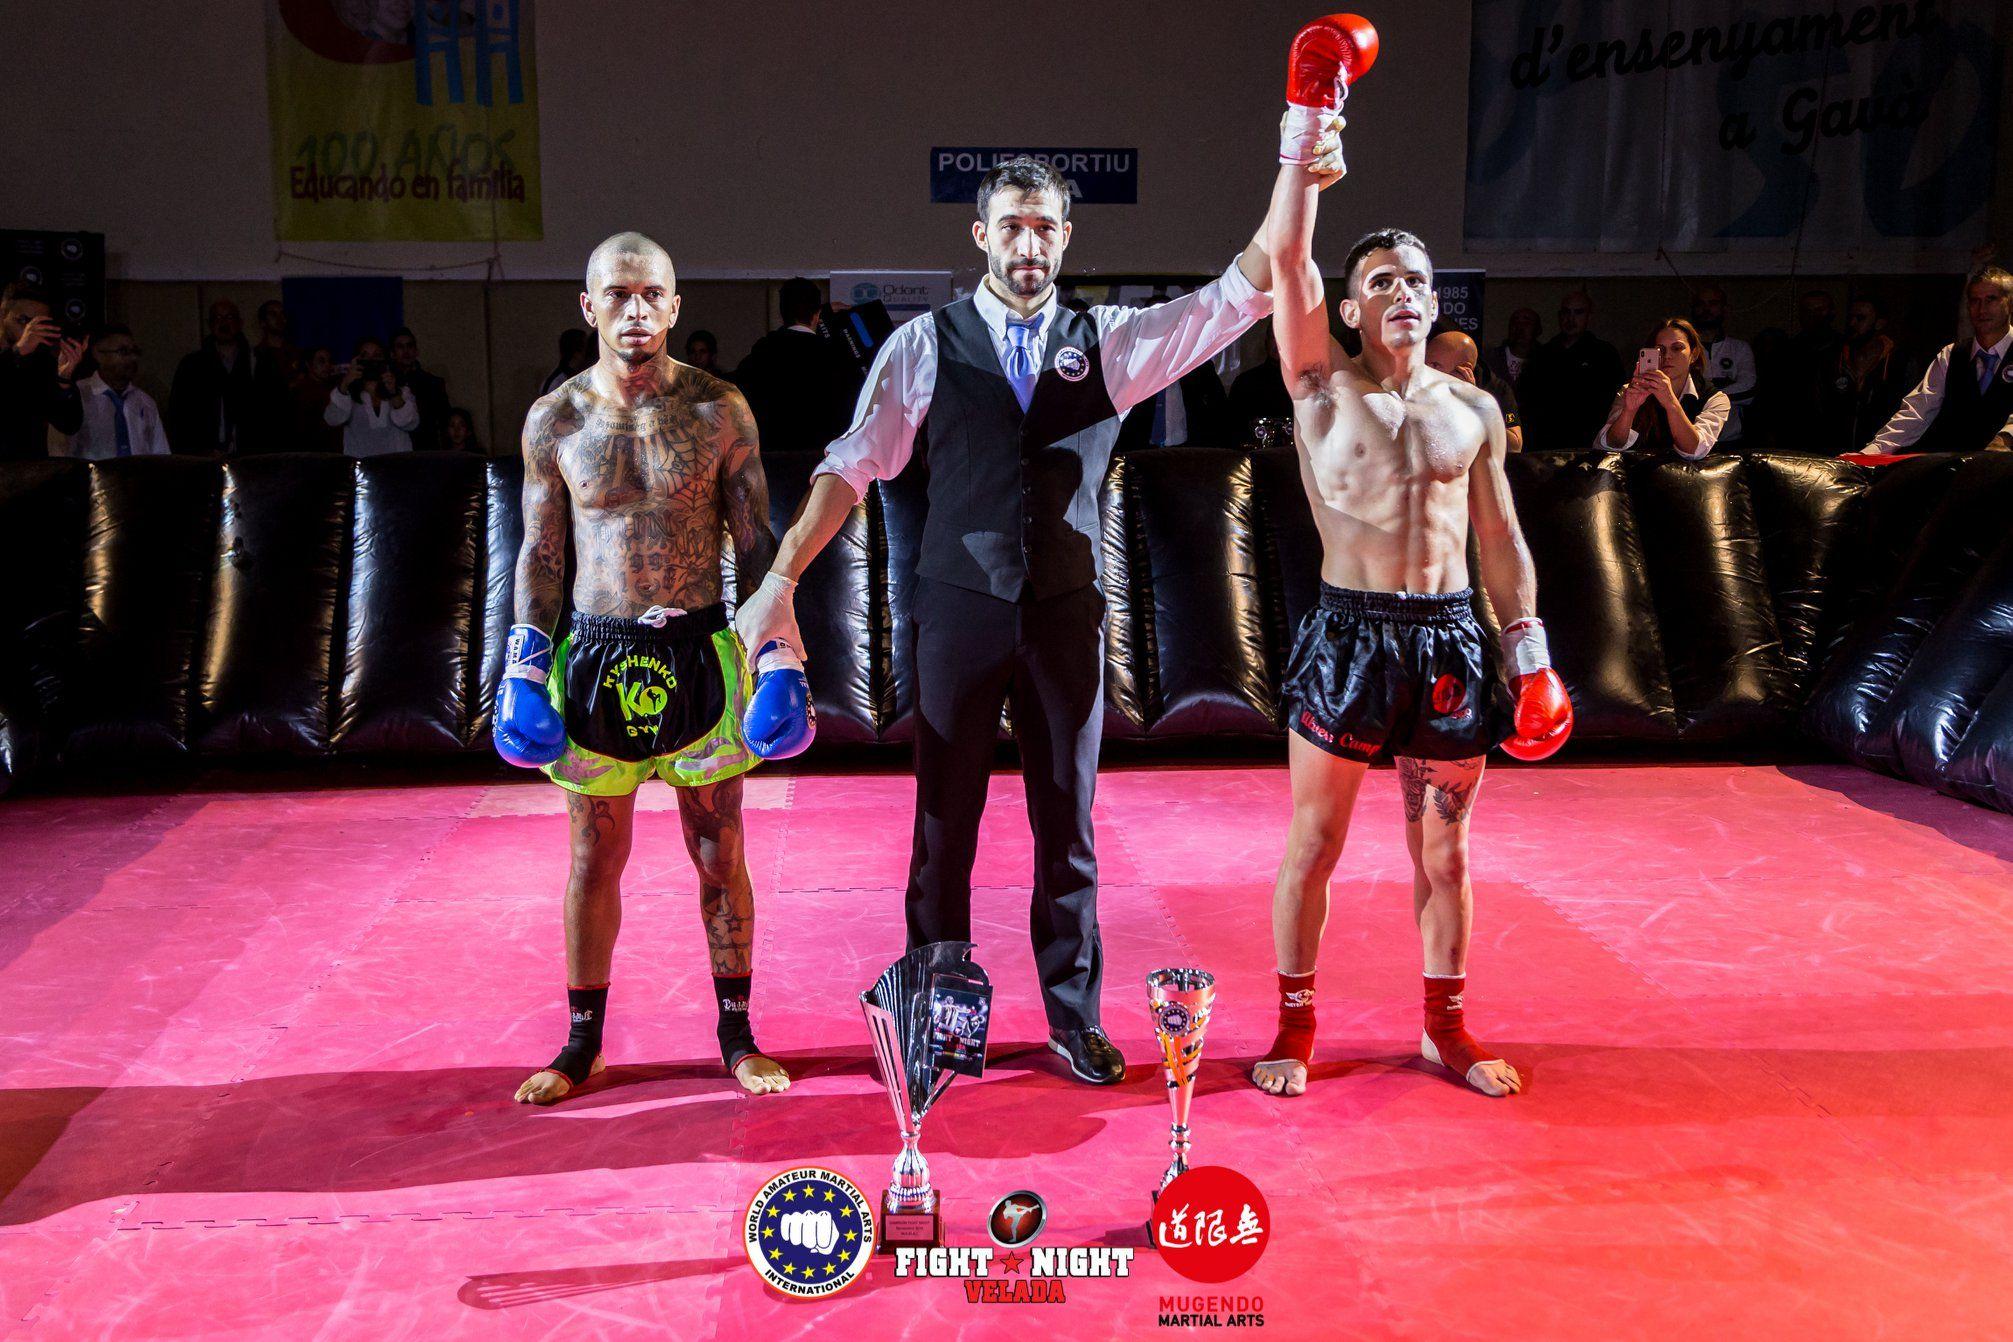 Fight Night 2019, el gran show marcial